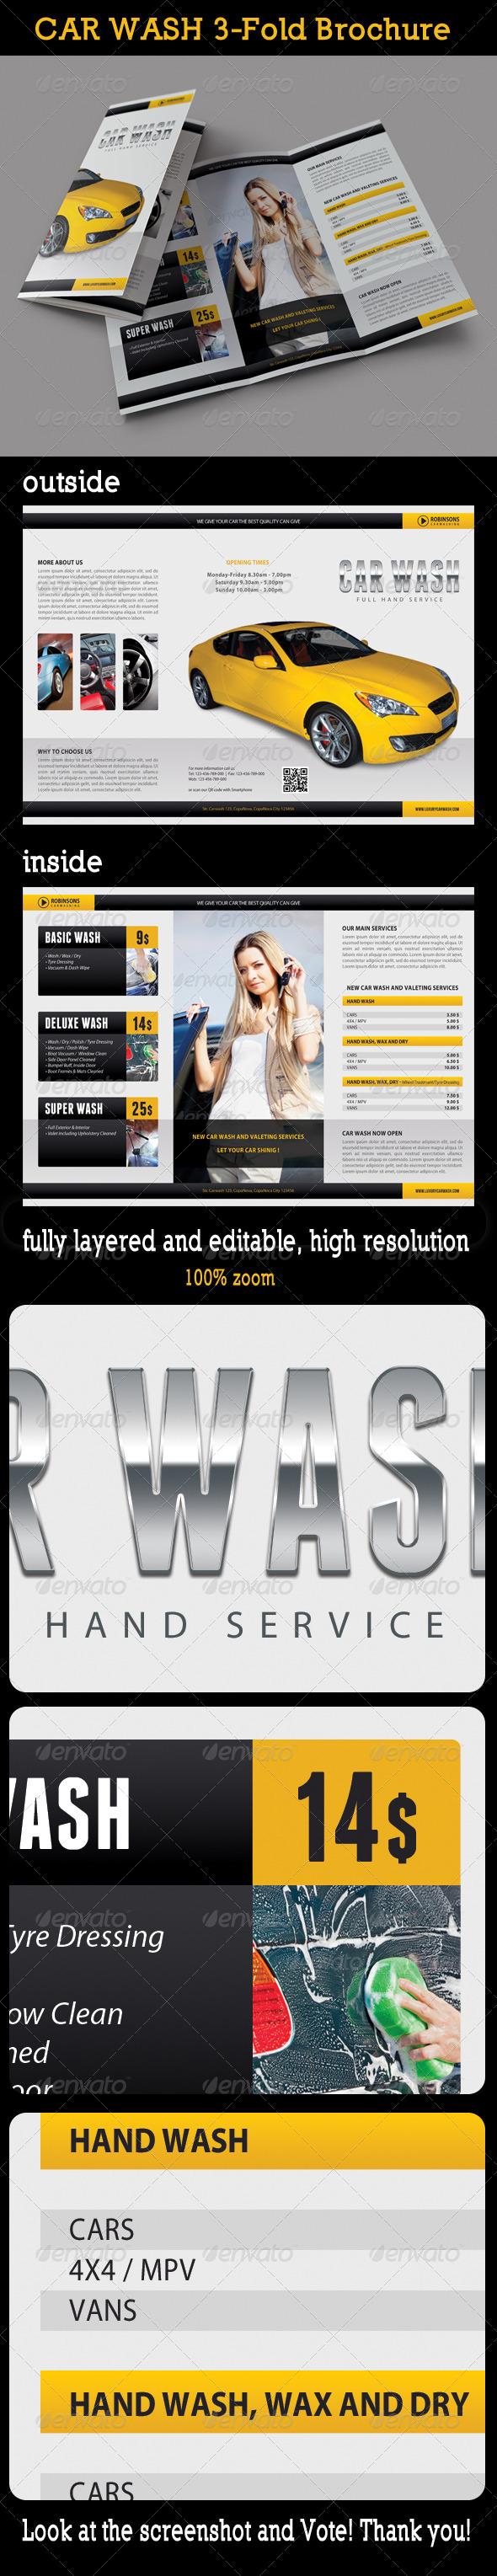 GraphicRiver Car Wash 3-Fold Brochure 7993926